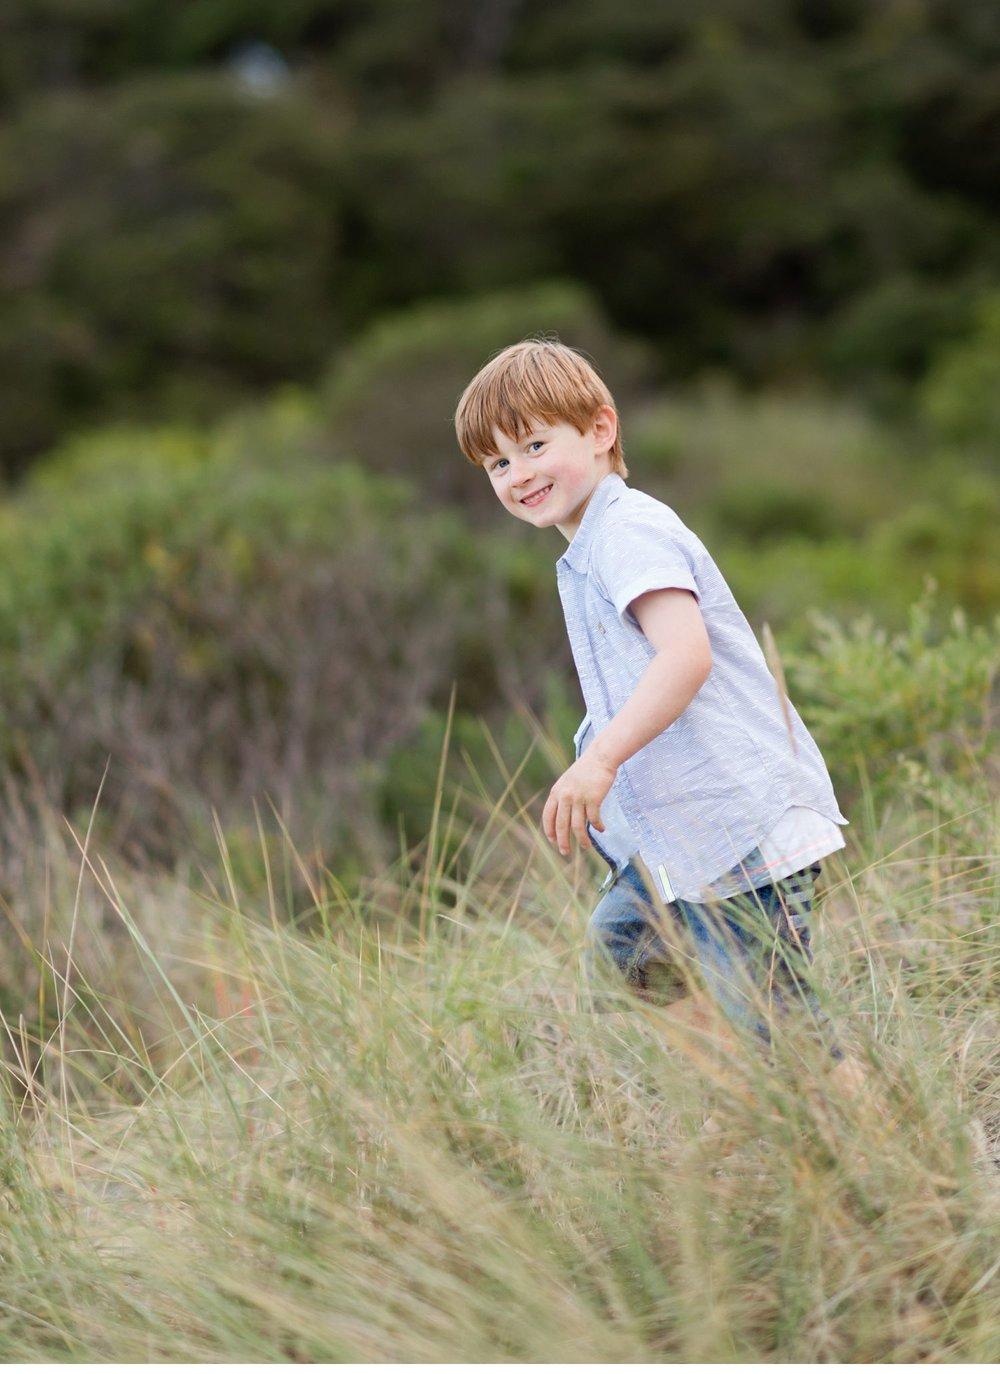 Family-photographer-berwick-endeavour-hills-portsea-melbourne.jpg